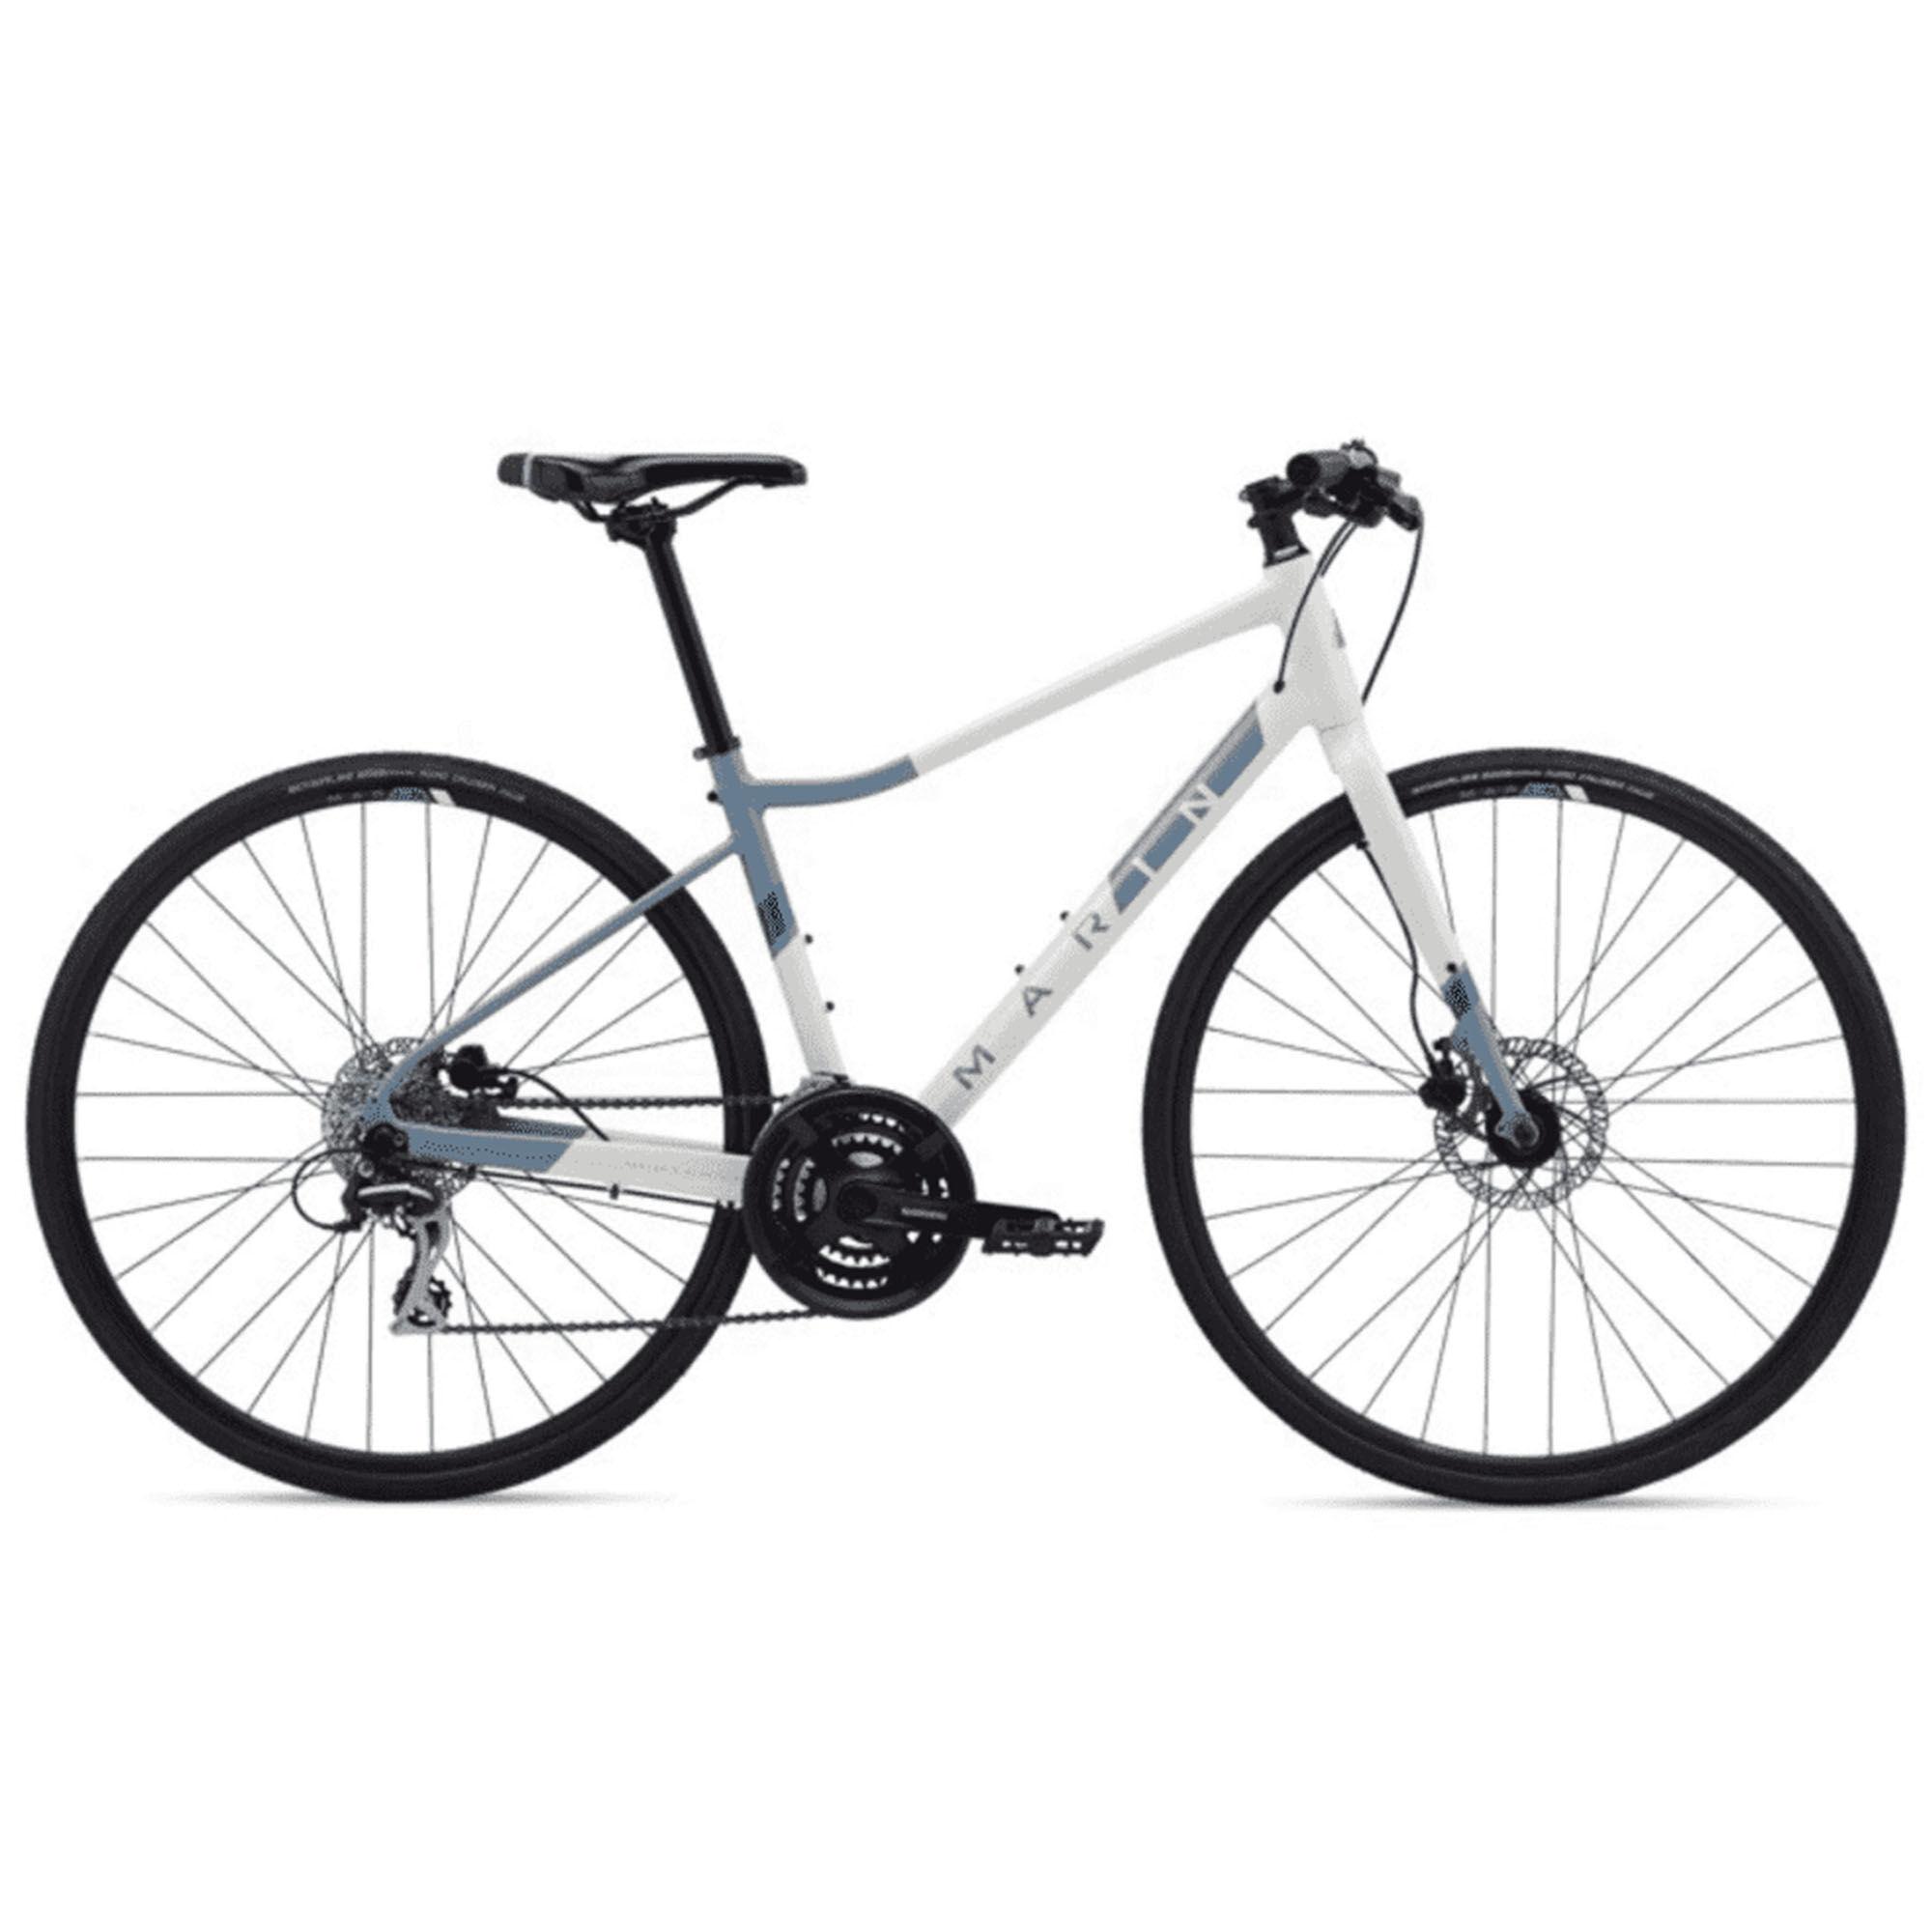 Marin Women's Terra Linda 2 Hybrid Bike '20  - Gloss White/Ash Blue/Deep Blue - Size: Small